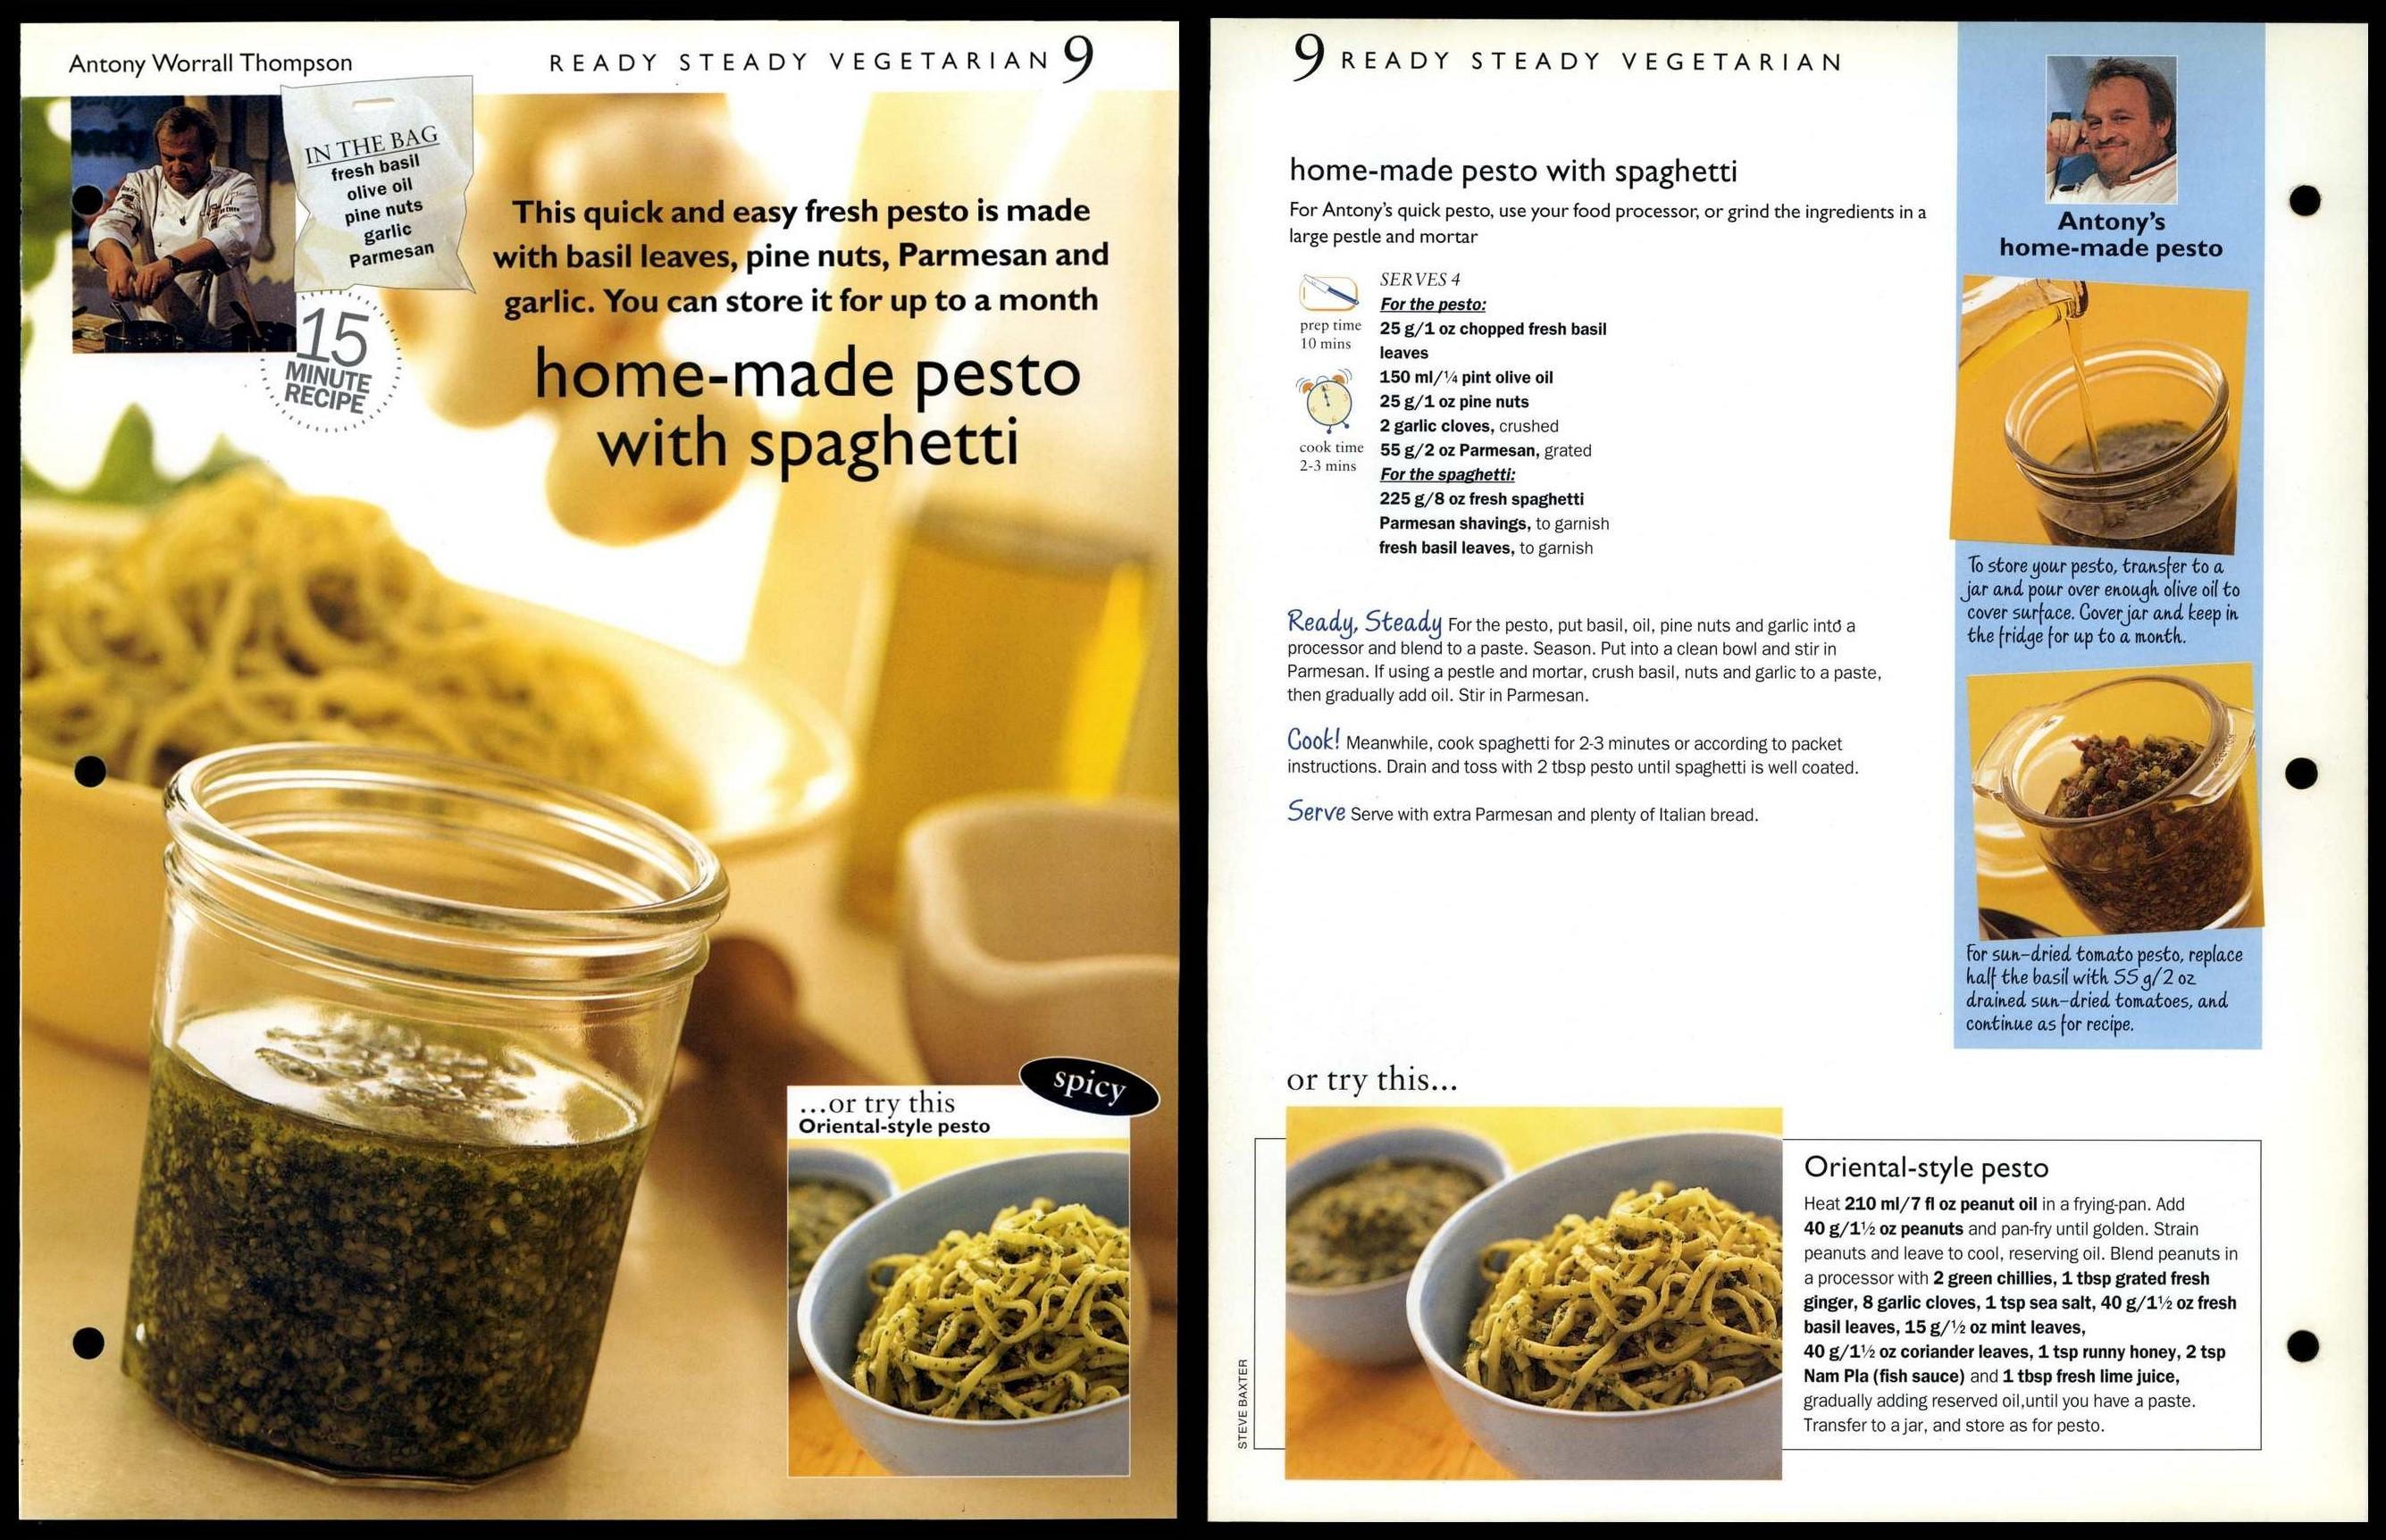 Antony worrall thompson food processor instructions